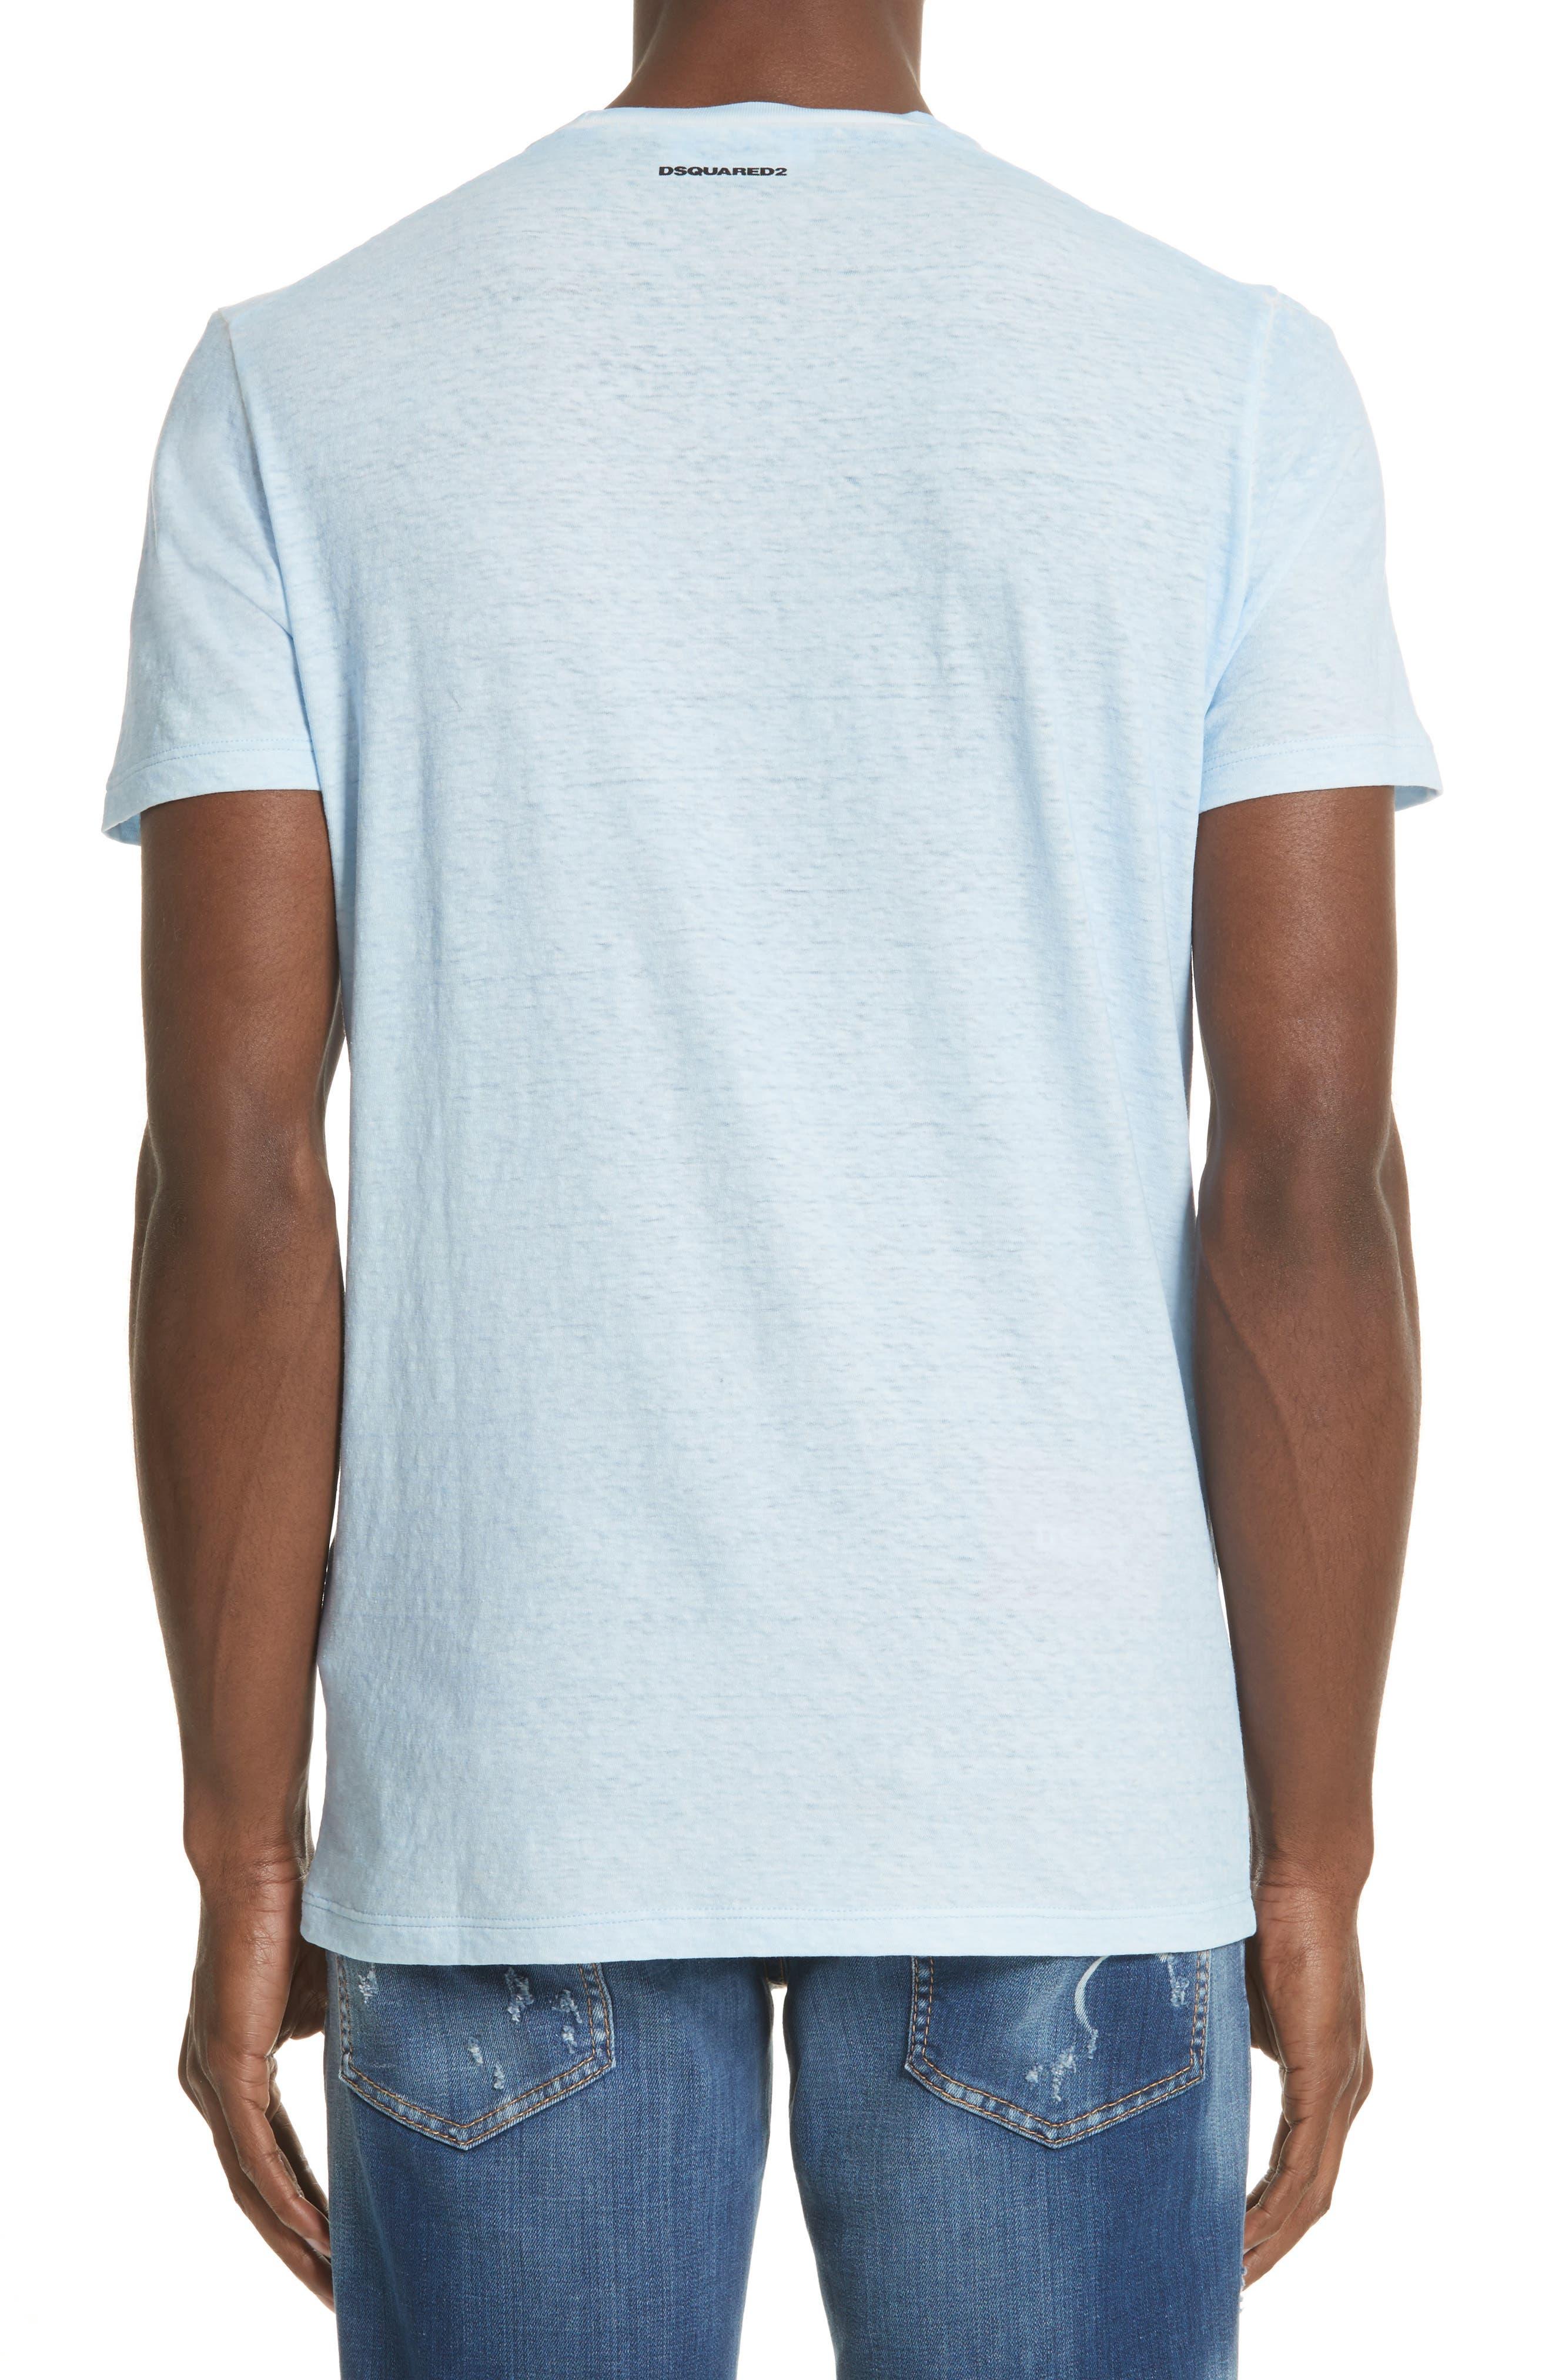 Alternate Image 2  - Dsquared2 D2 Logo Graphic T-Shirt